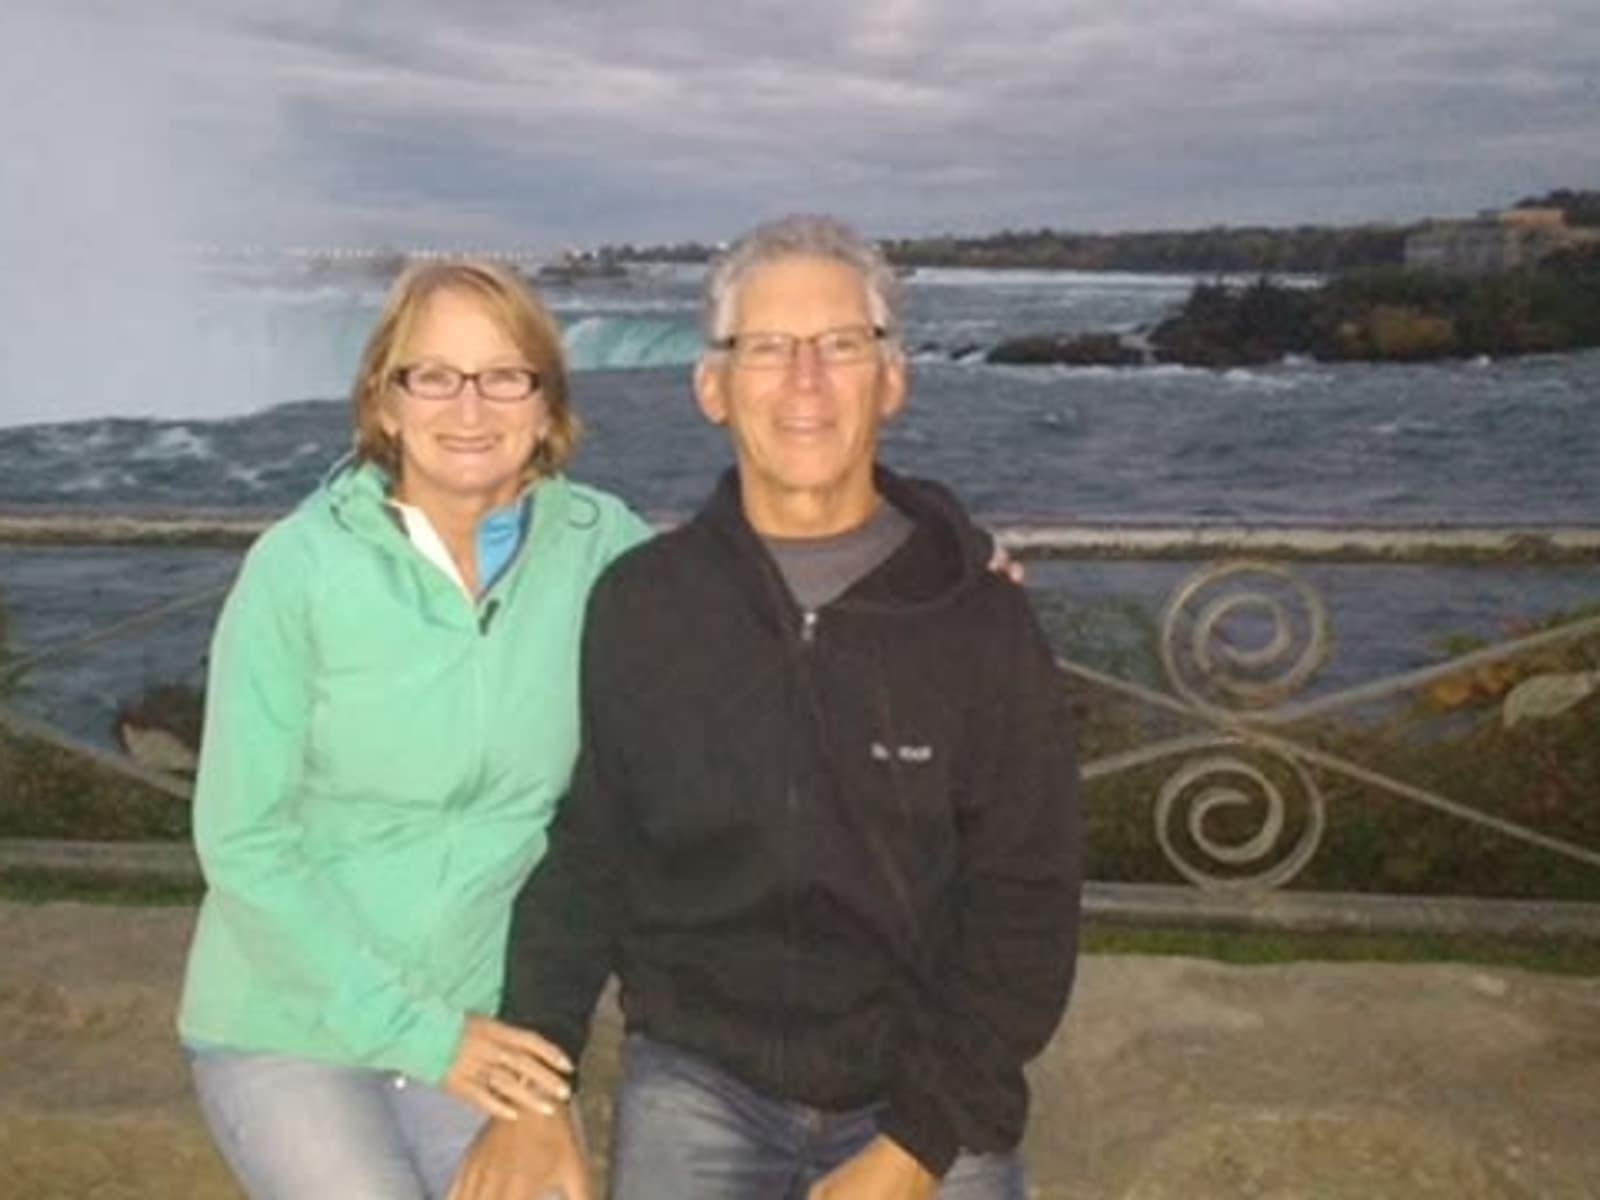 Bonita & Gary from Oxford, Nova Scotia, Canada